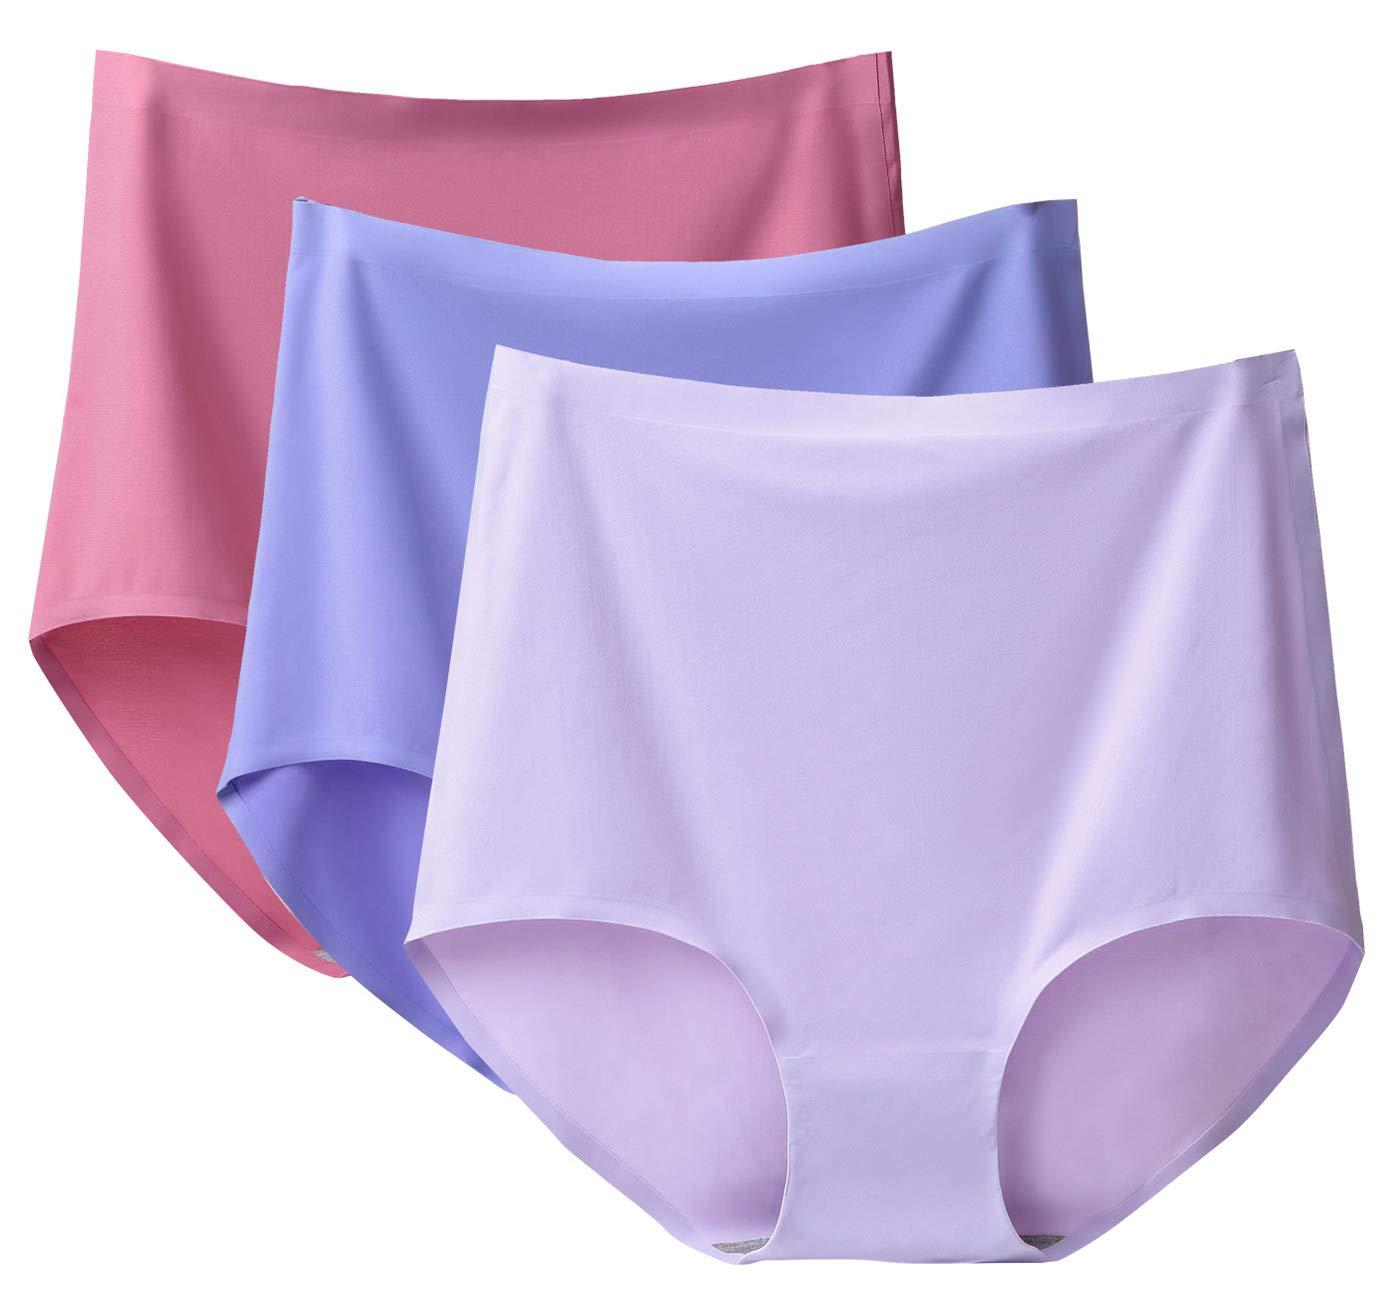 FEOYA Women High Waist Plus Size Panties No Show Full Coverage Underwear Briefs